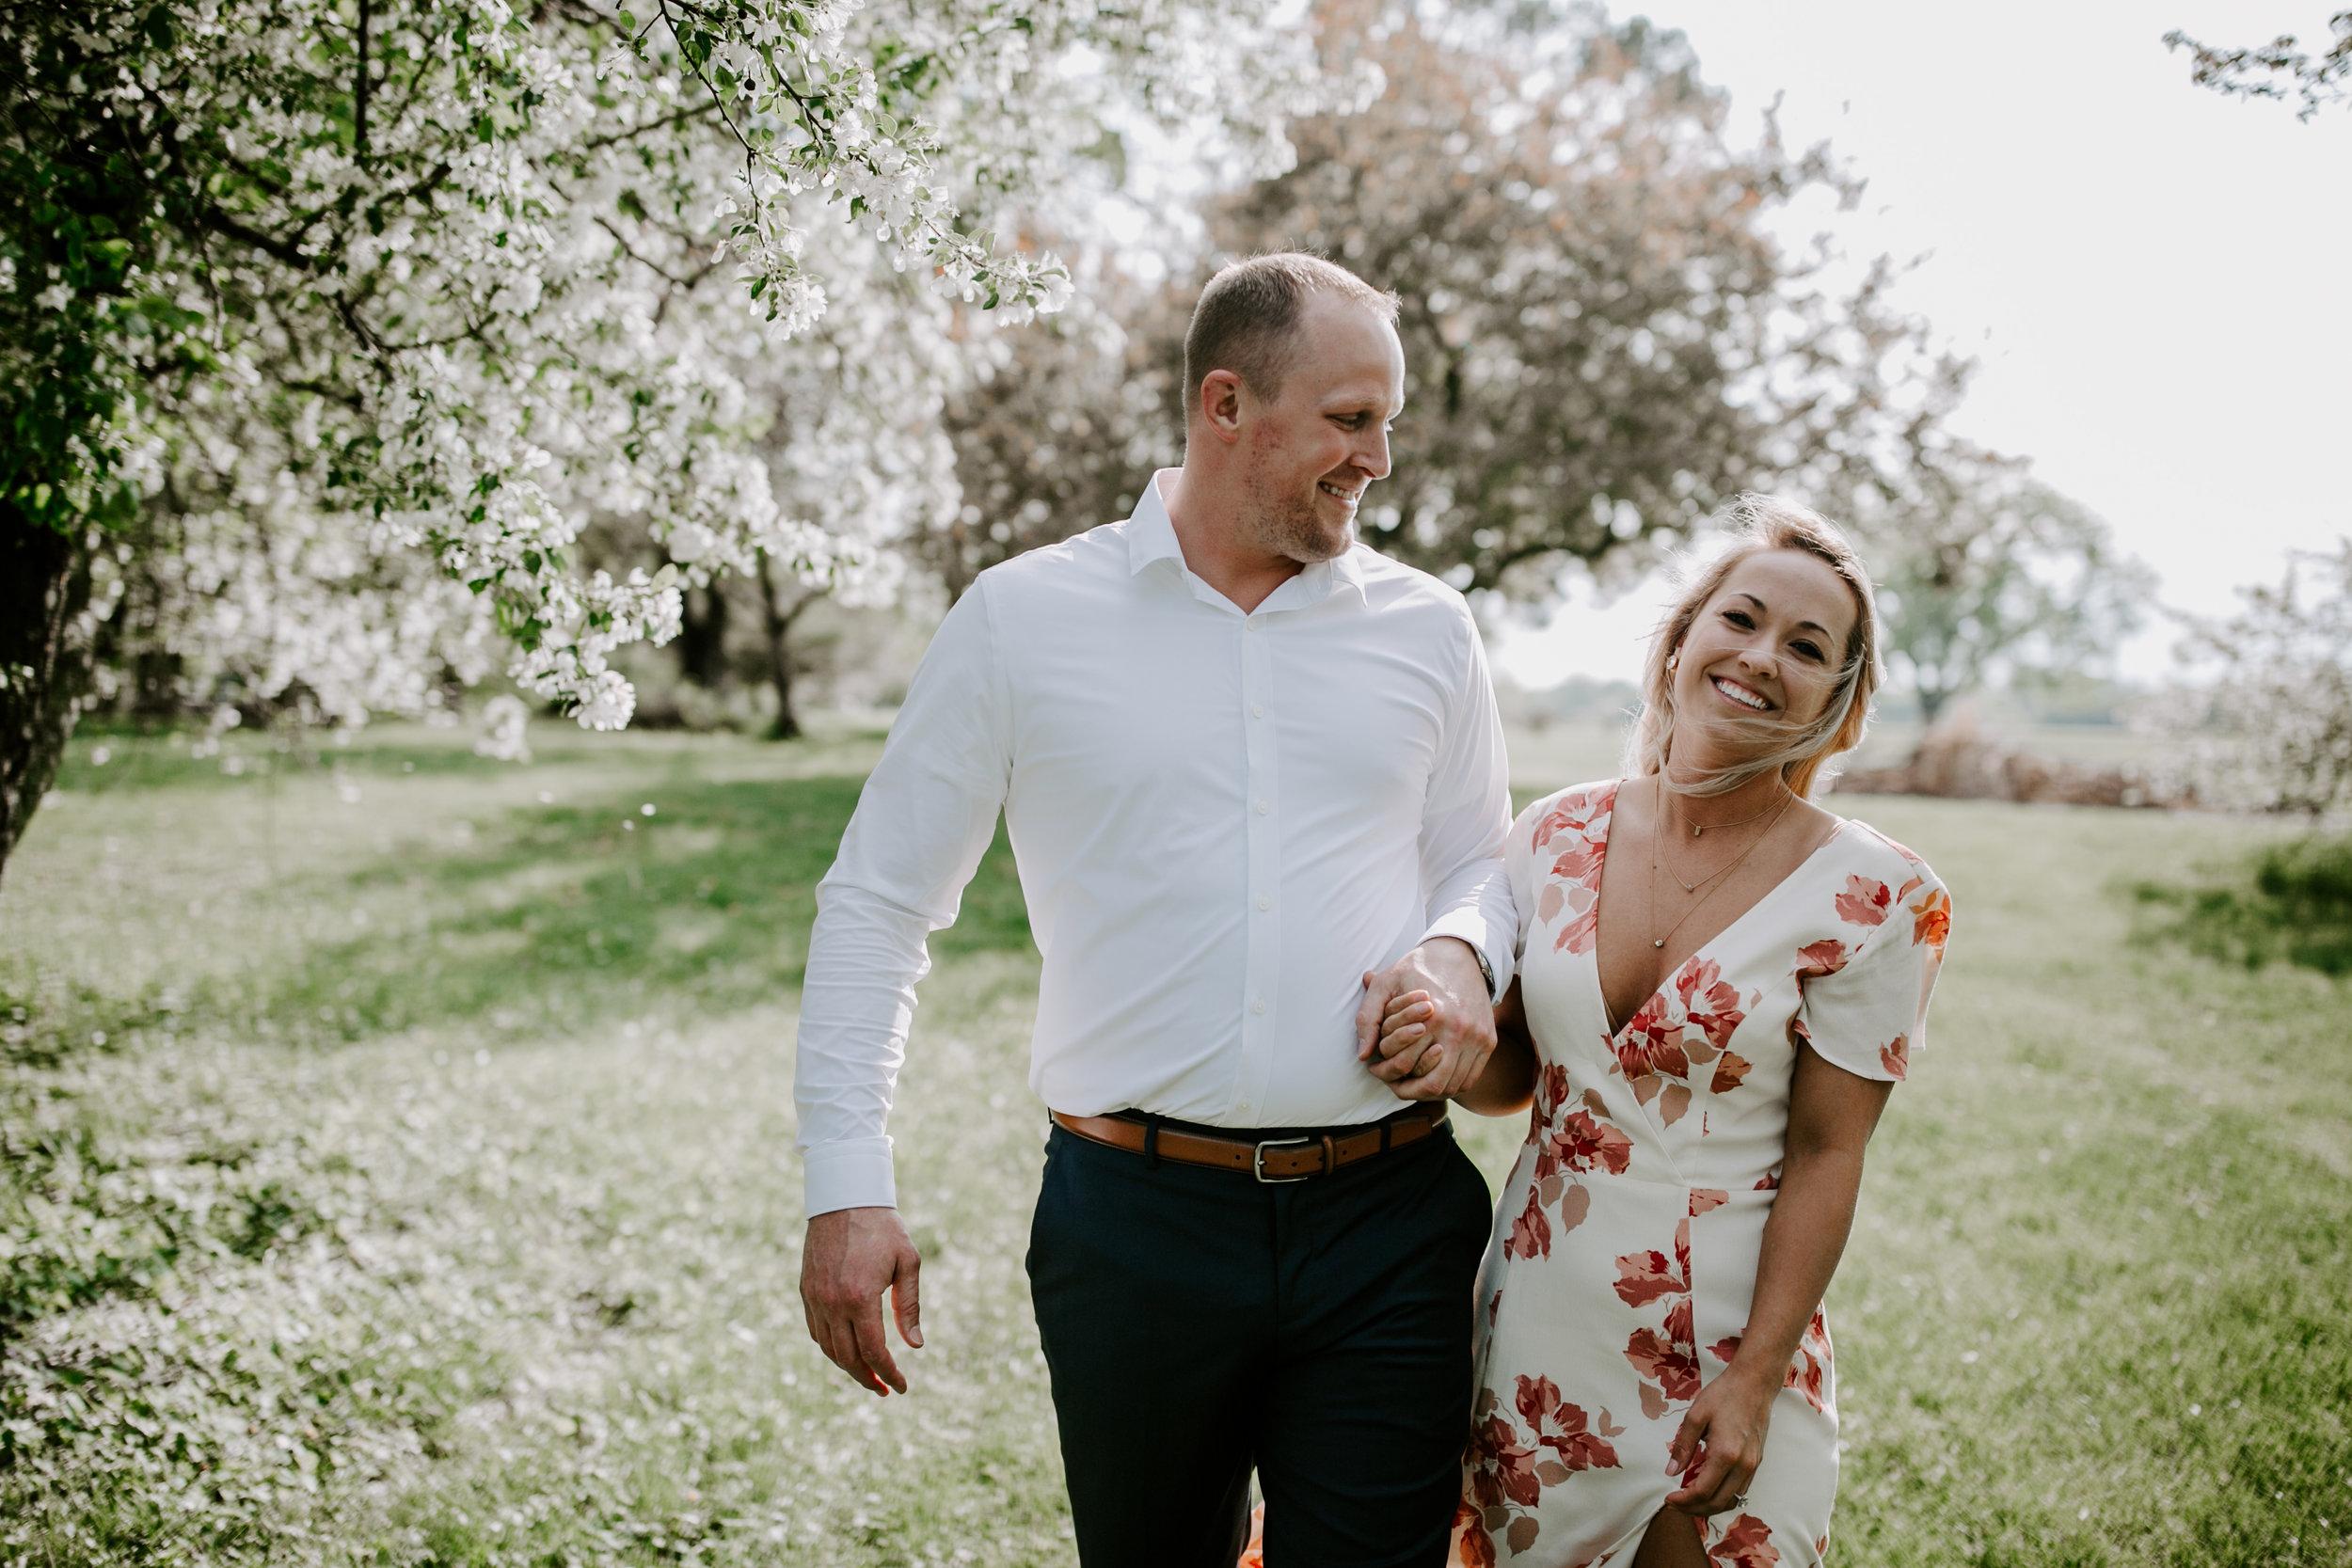 gracetphotography-wedding-photographer-adventure-bride-engagement-midwest-7.jpg